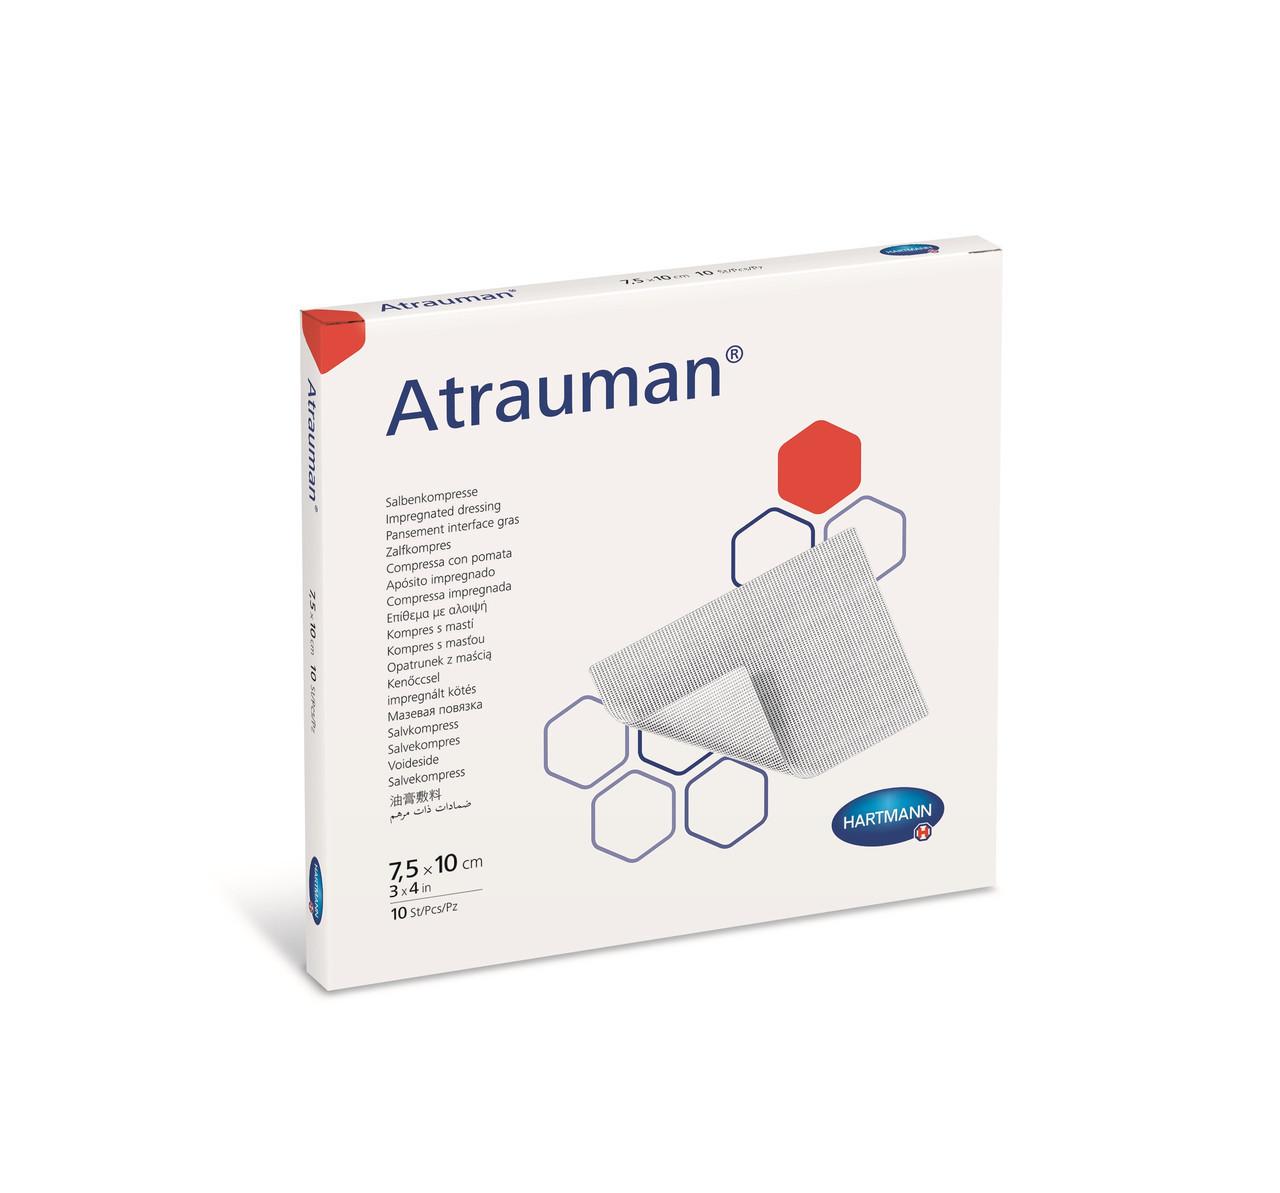 Atrauman / Атрауман мазевая повязка, атравматическая, стерильная, 5 х 5 см